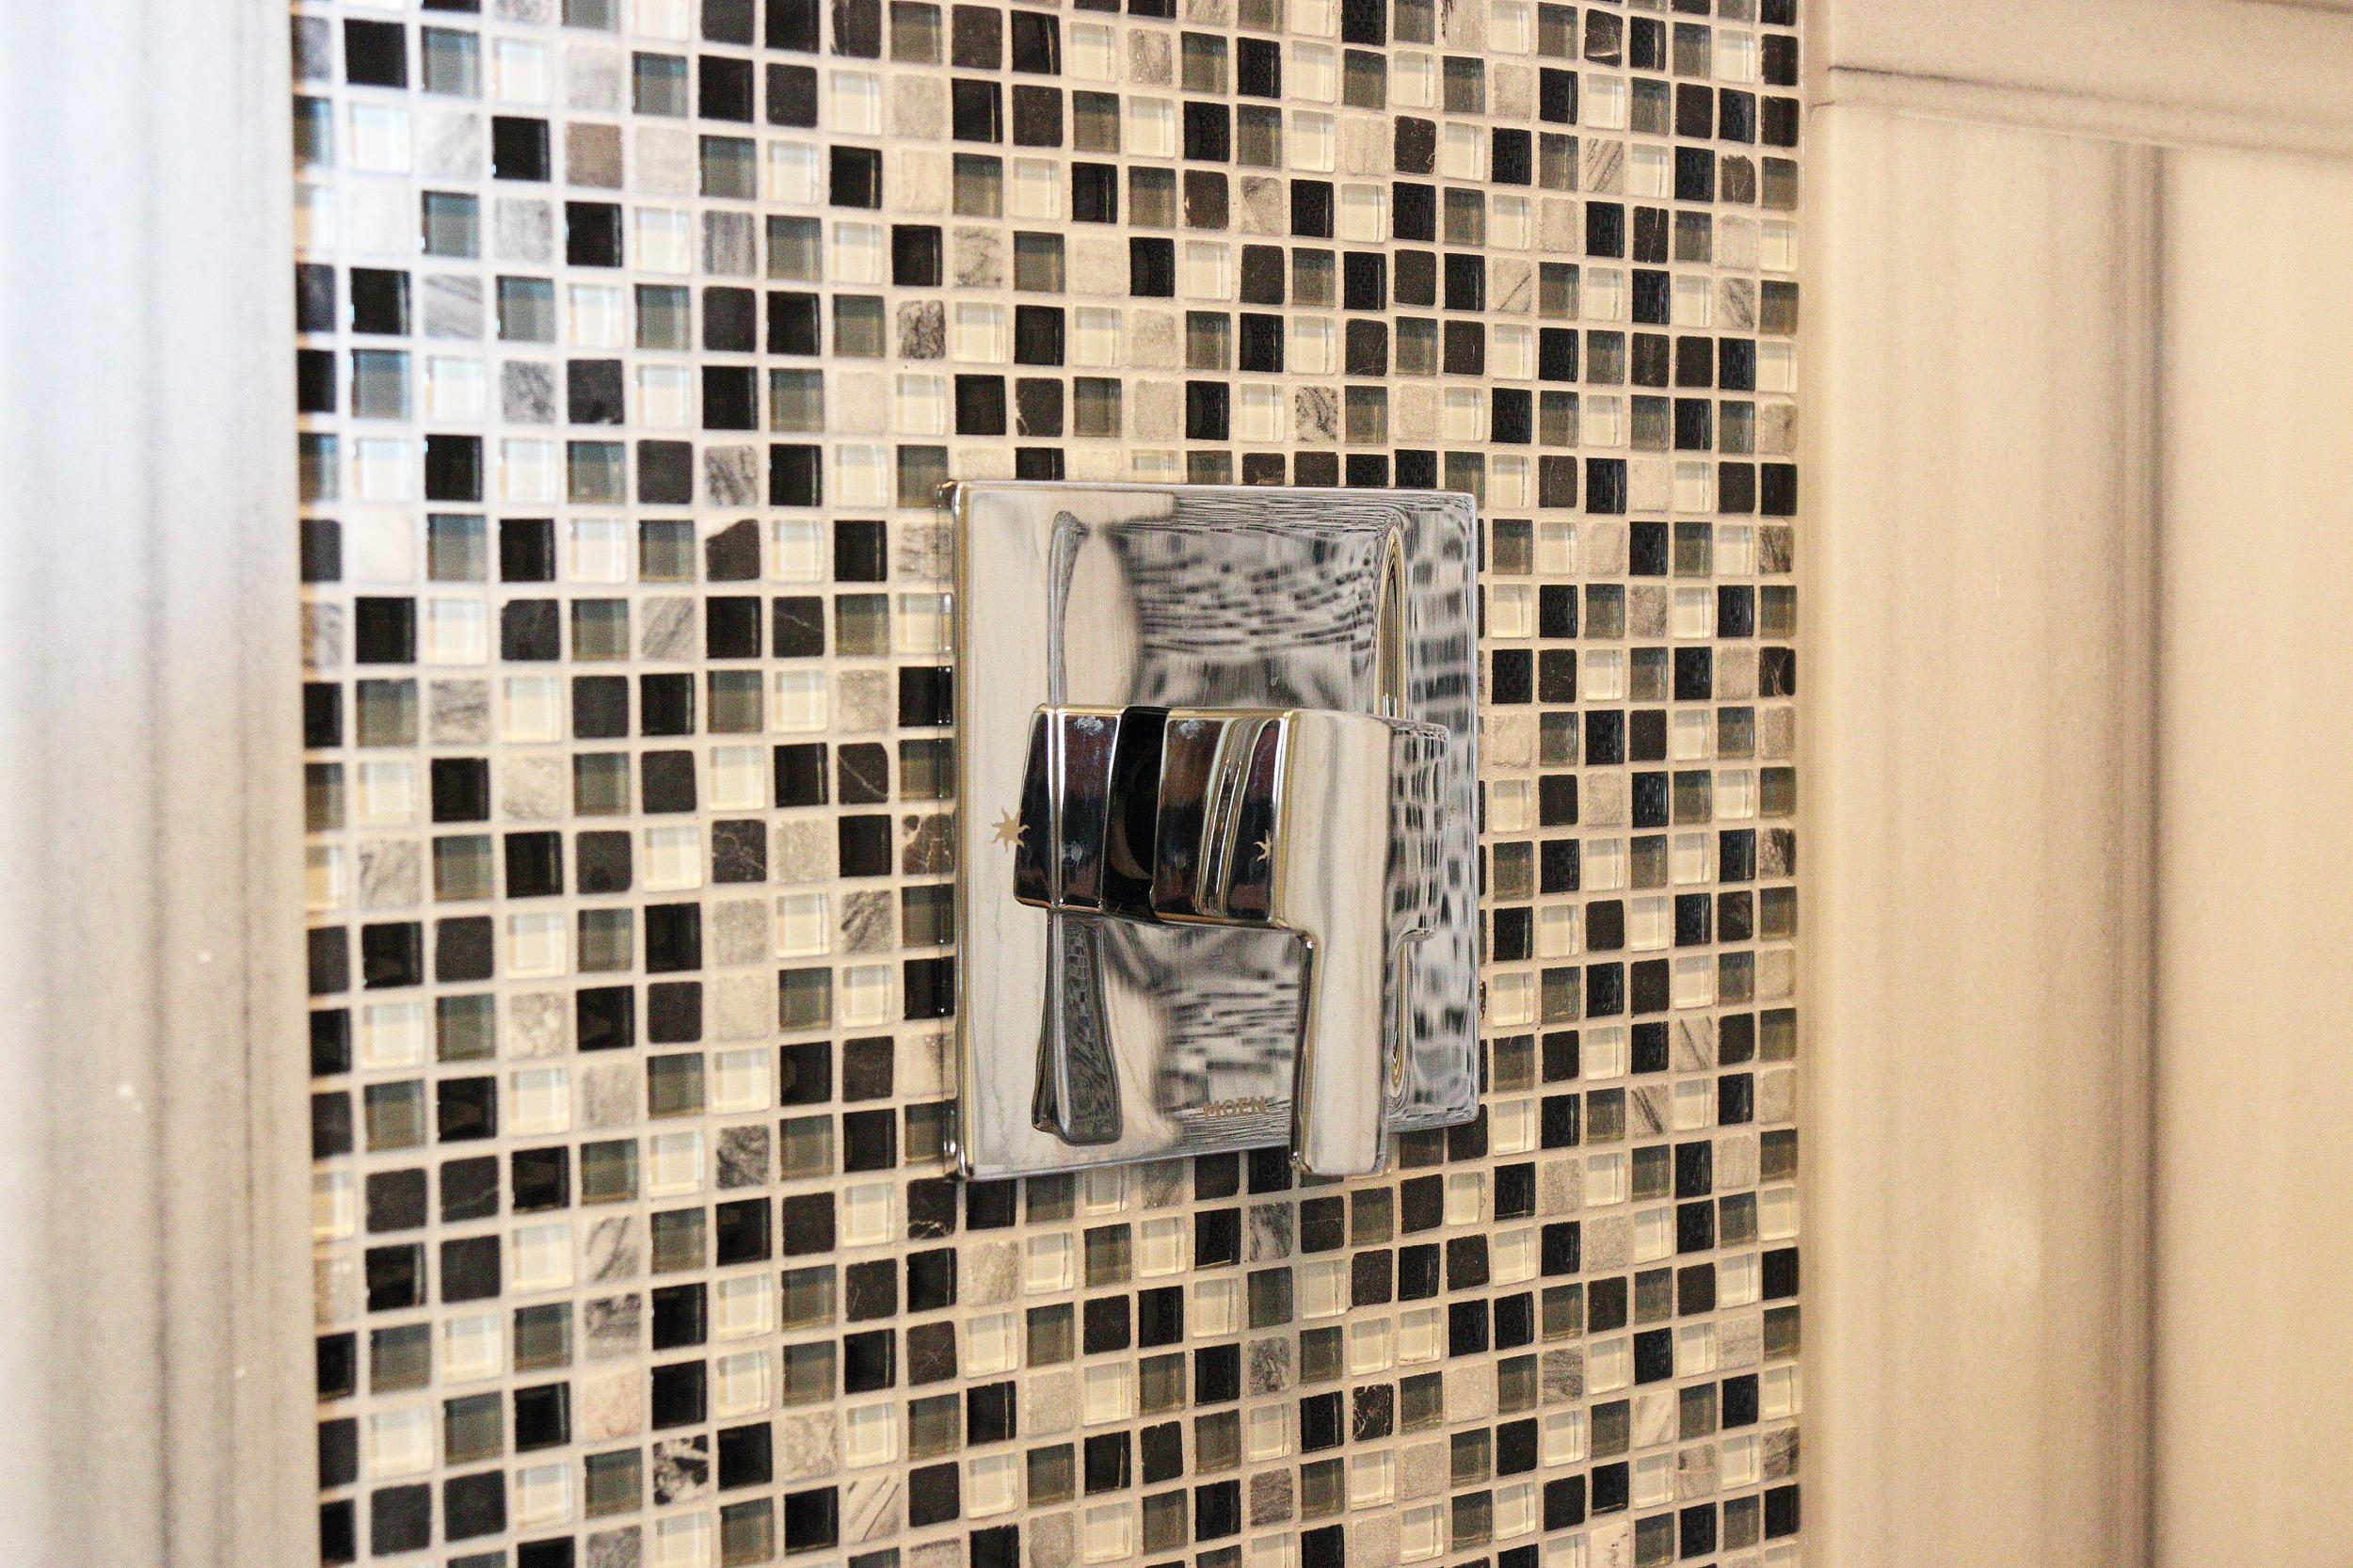 25 Scugog Bathroom shower faucet.jpg